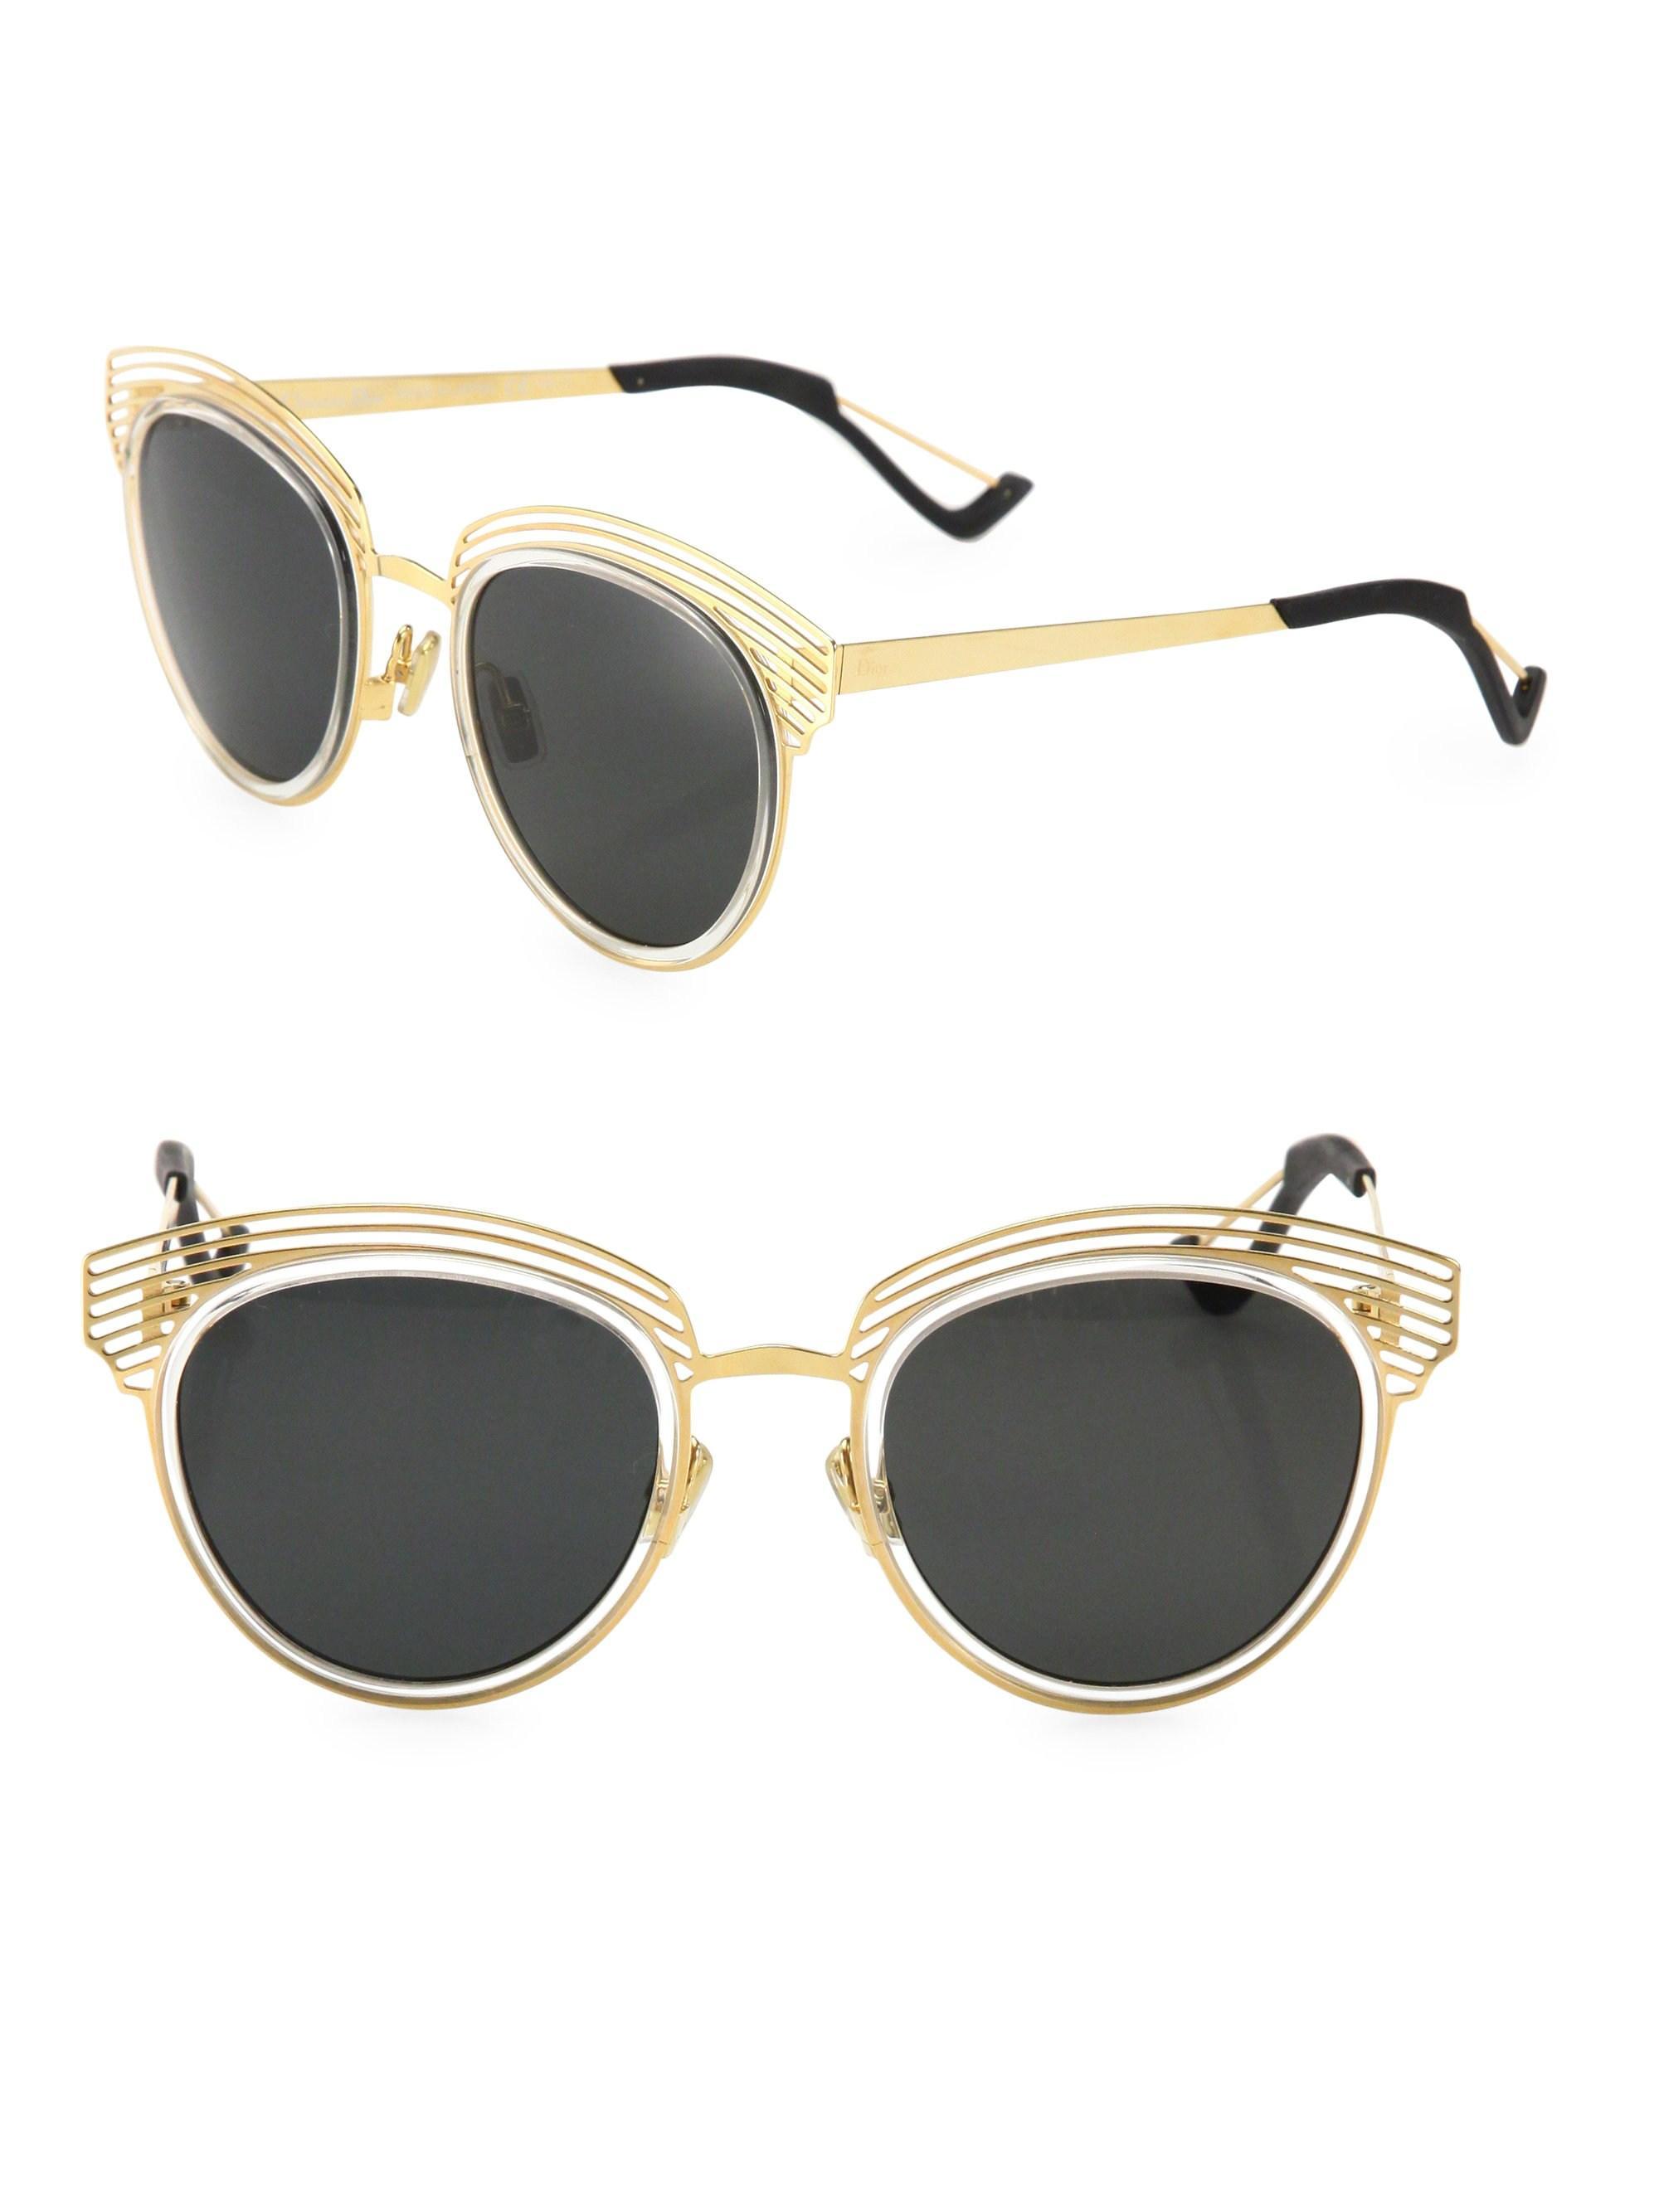 5420bf7452b2 Dior Enigme 51mm Aviator Sunglasses in Metallic - Lyst